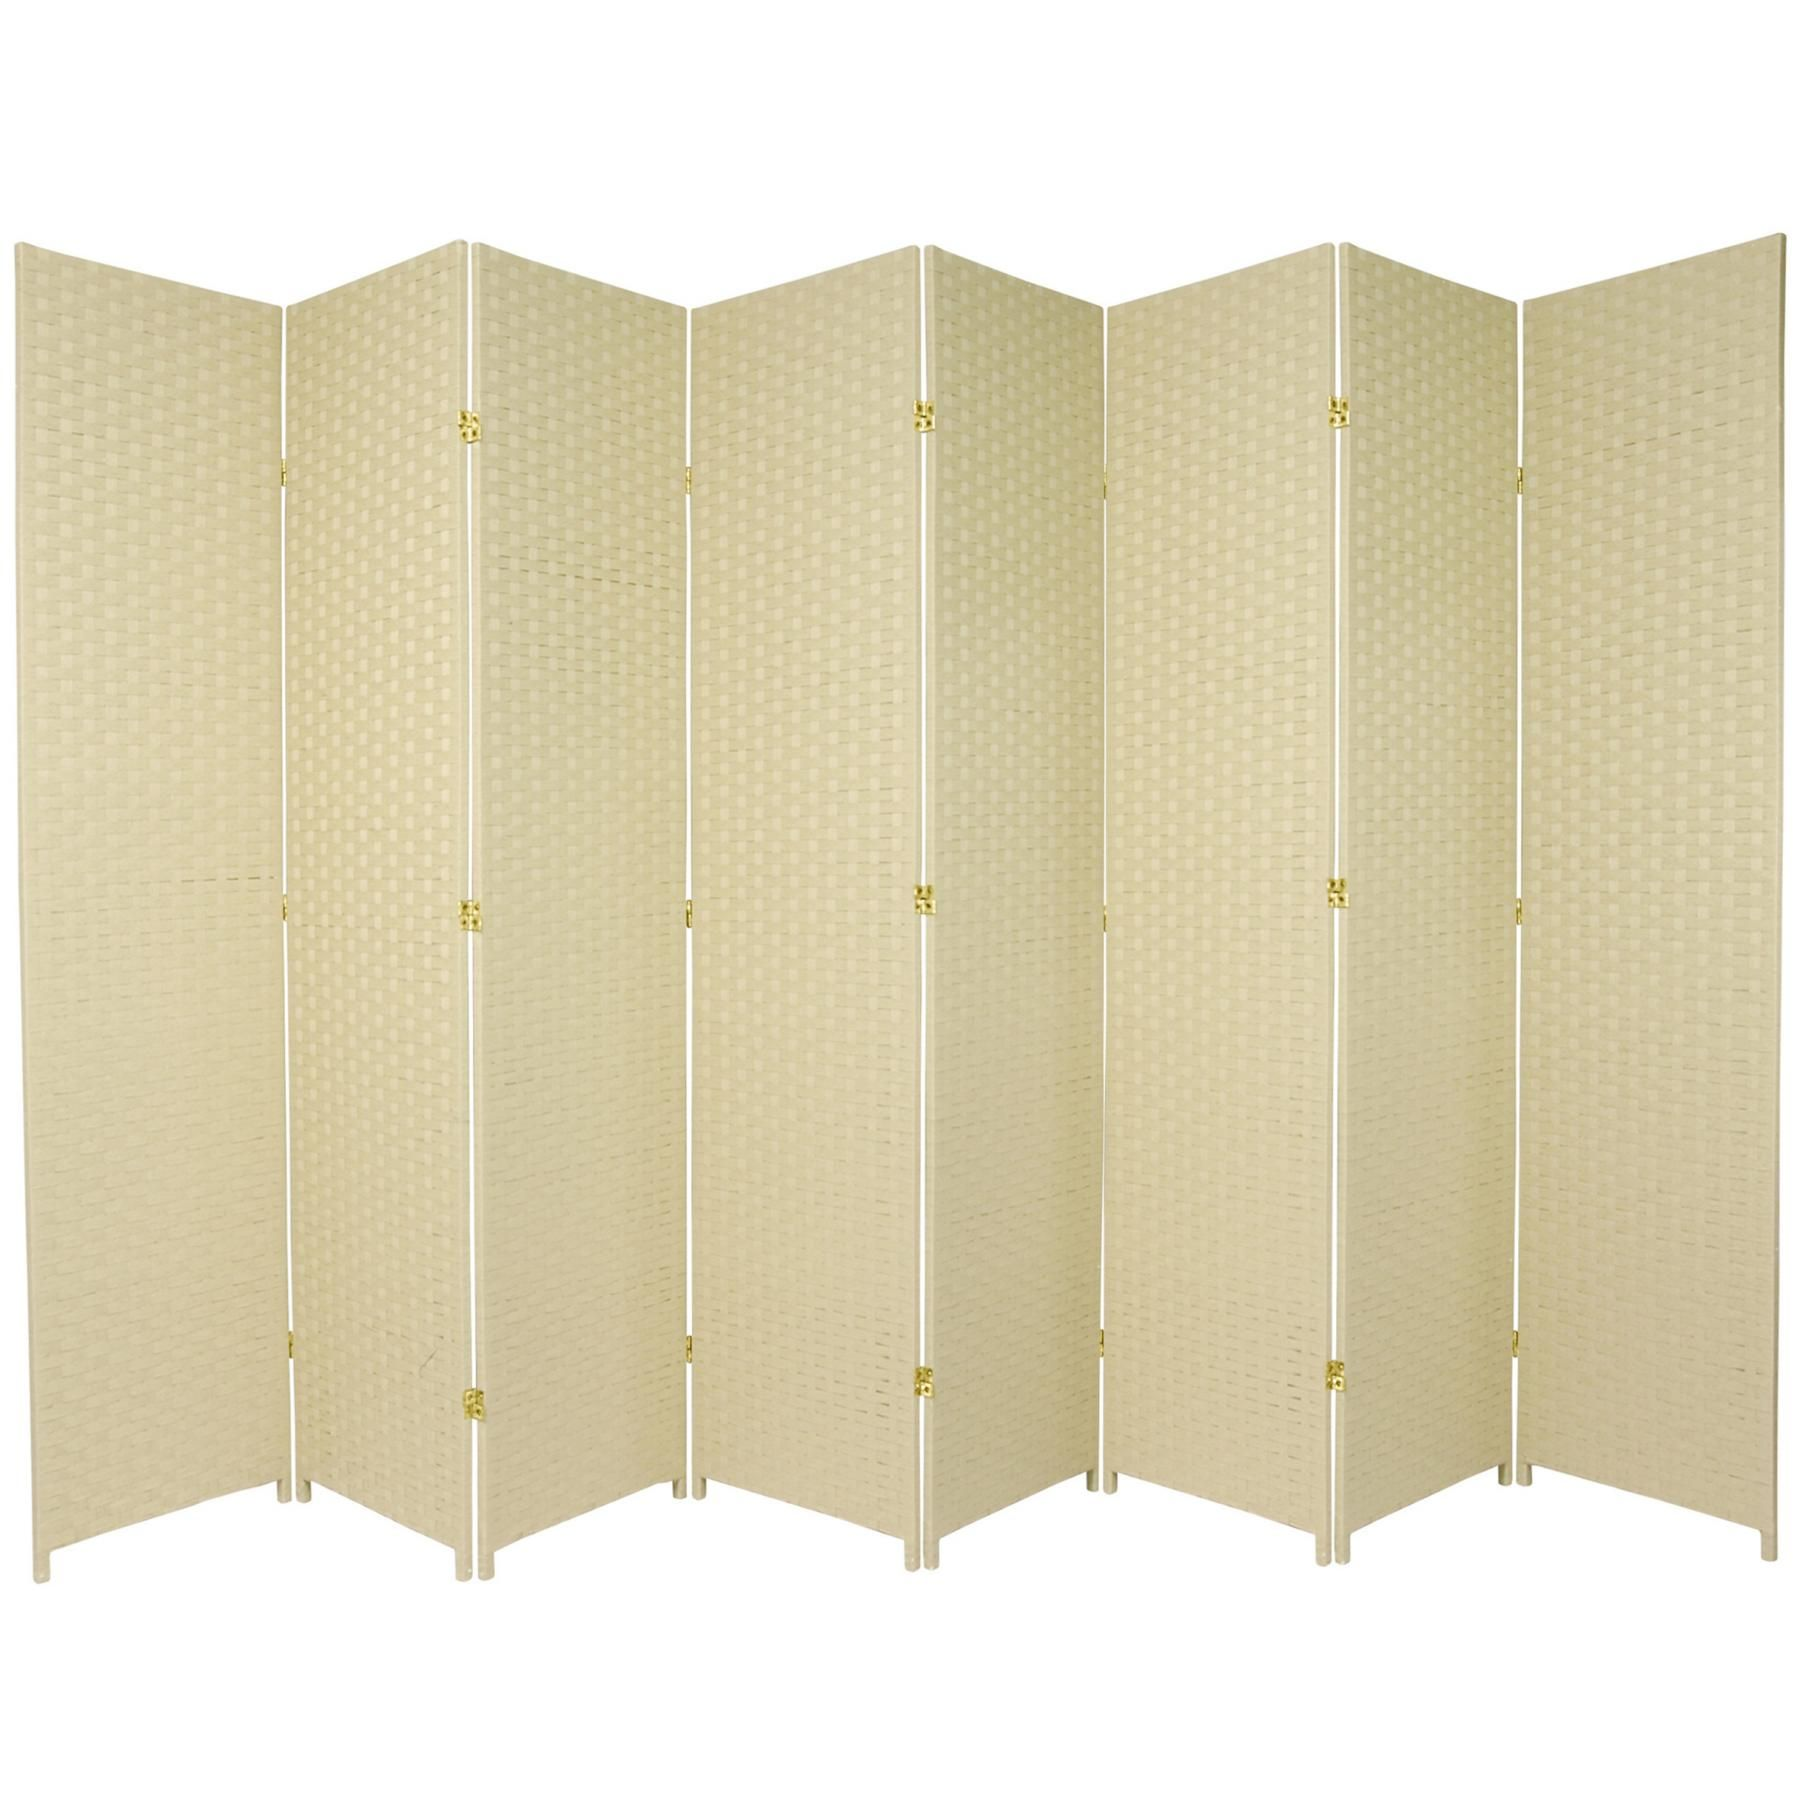 7 Ft Tall Woven Fiber Room Divider Room Divider Oriental Furniture Panel Room Divider